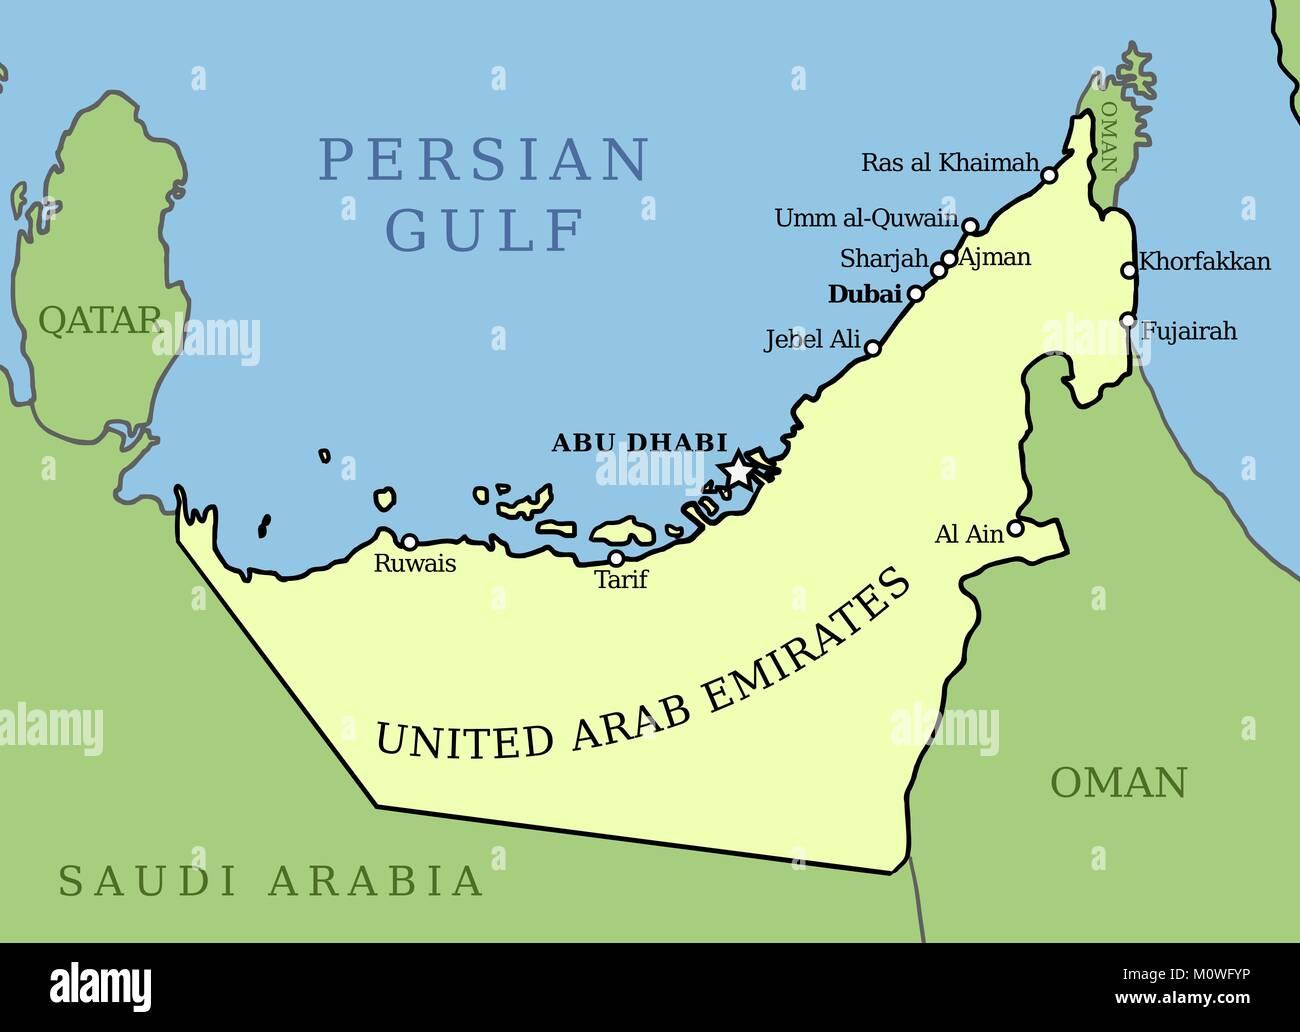 Abu Dhabi Map Stockfotos & Abu Dhabi Map Bilder - Alamy